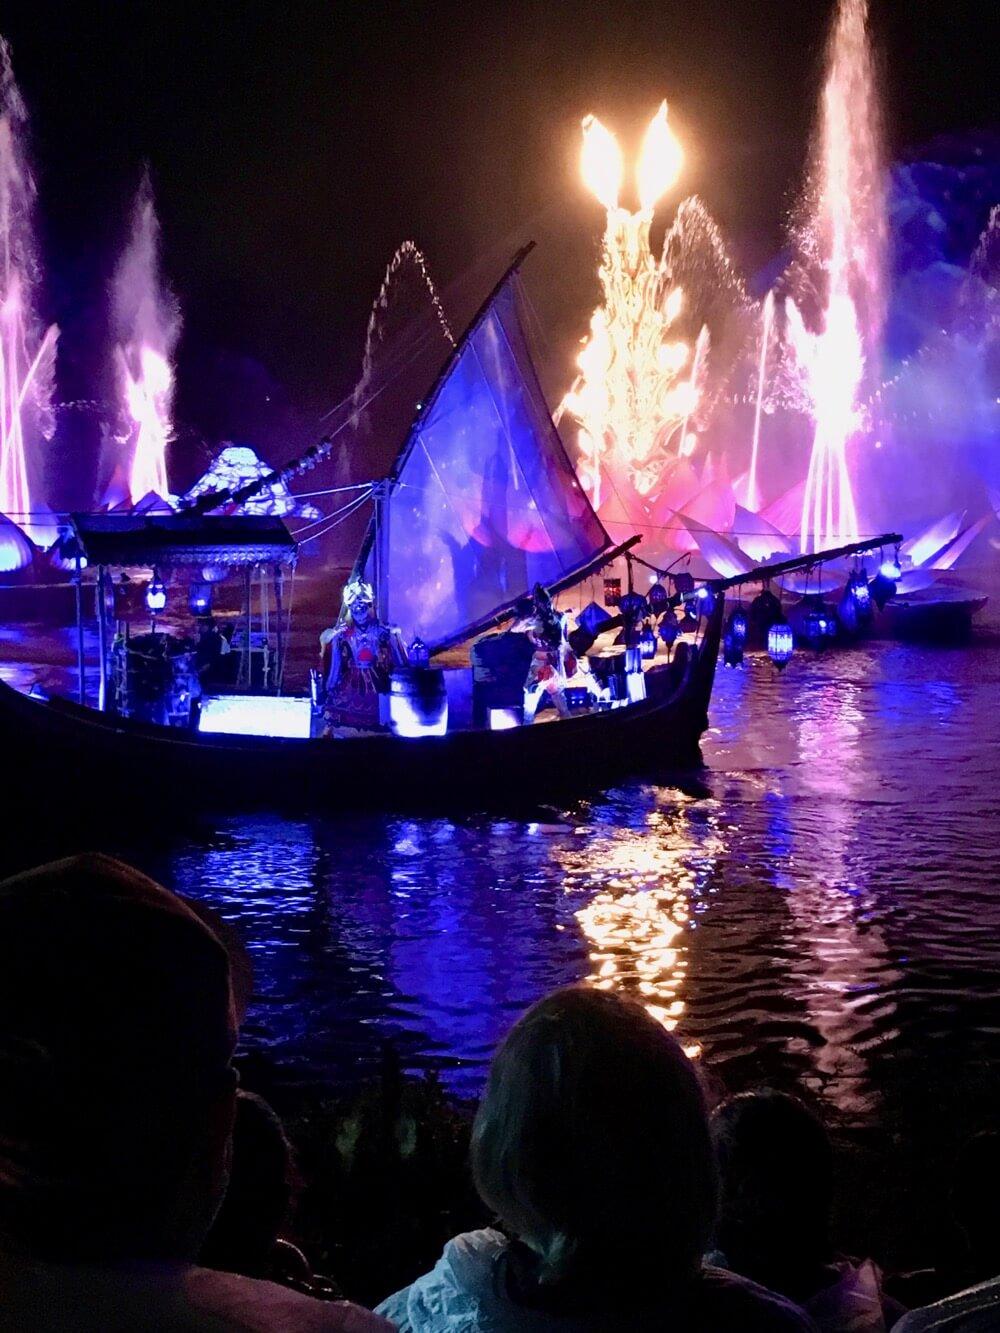 Fourth of July at Disney World - Disney's Animal Kingdom - Rivers of Light